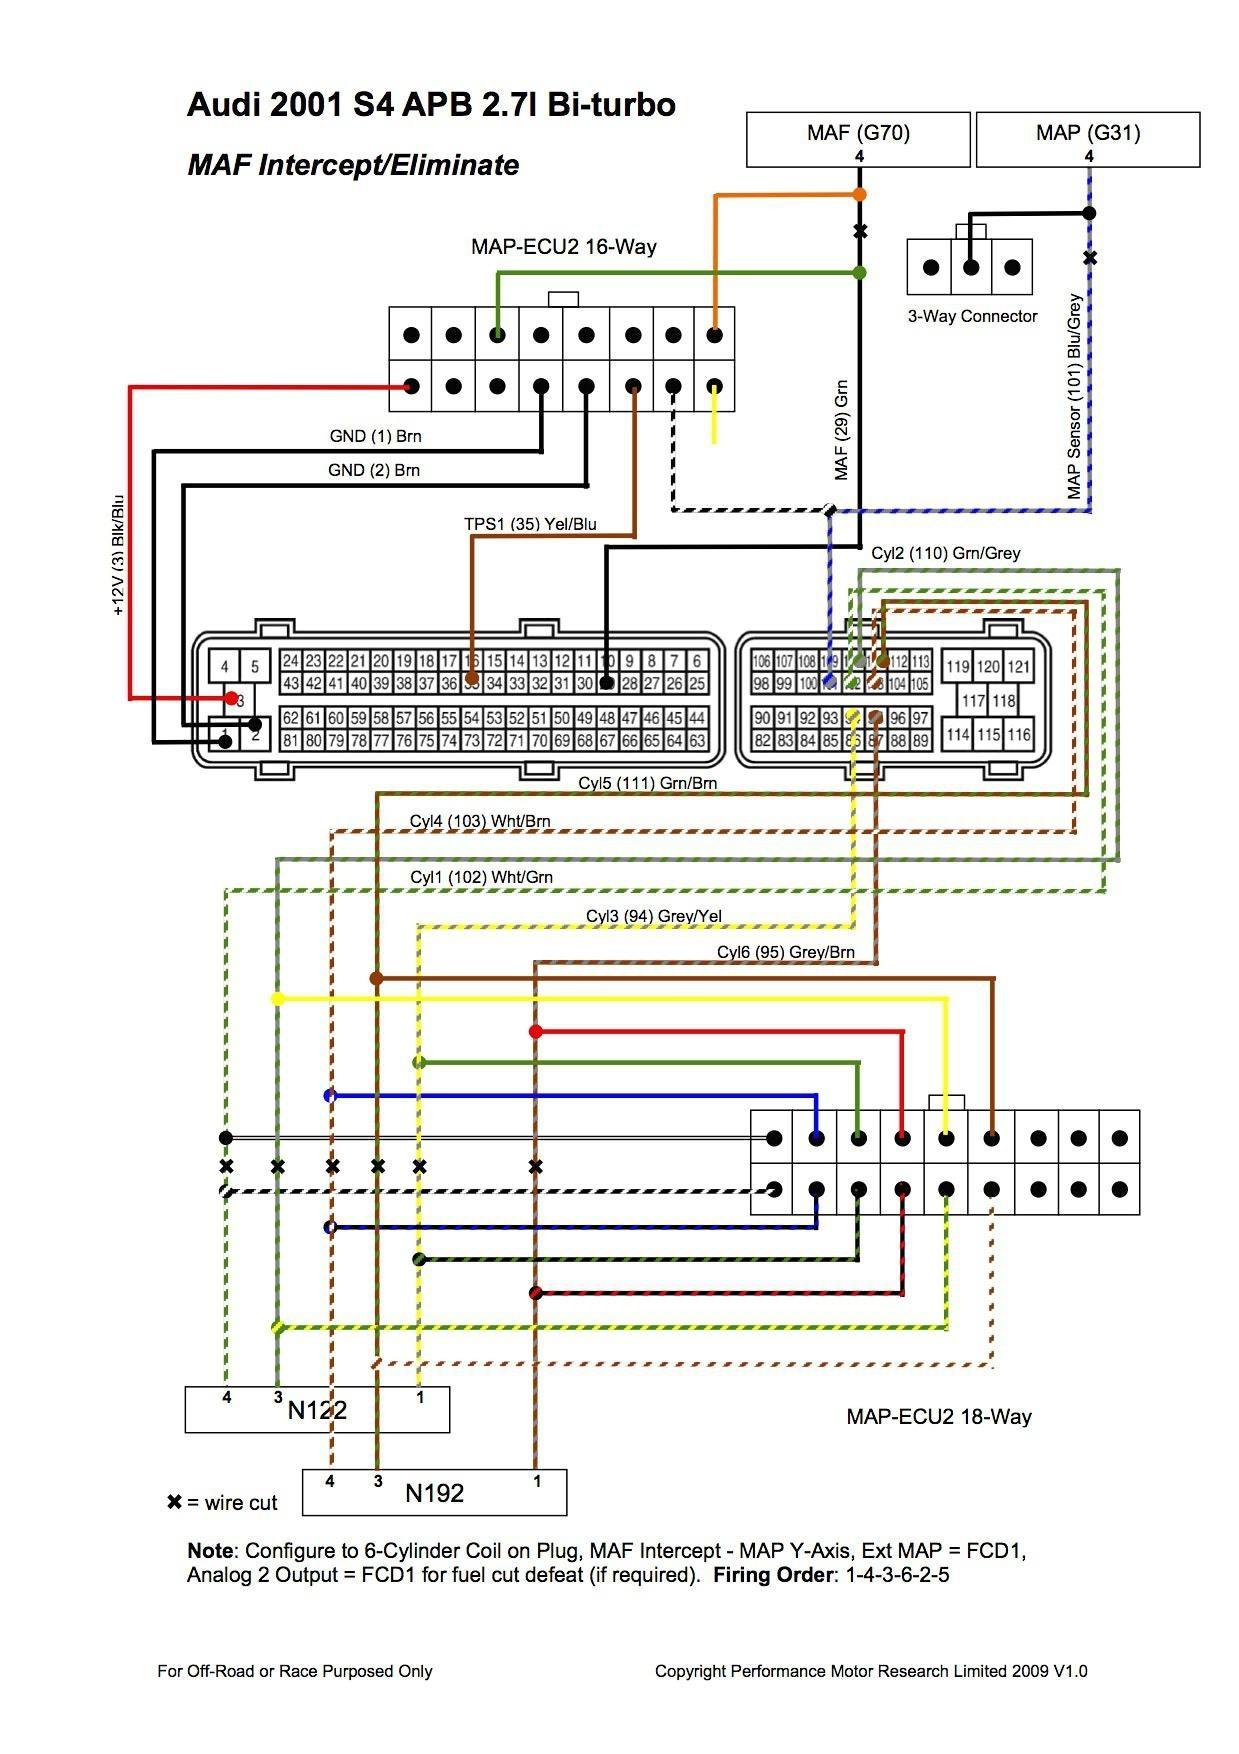 2018 Ram 1500 Radio Wiring Diagram : radio, wiring, diagram, Dodge, Radio, Wiring, Diagram, Structure, Self-future, Self-future.vinopoggioamorelli.it